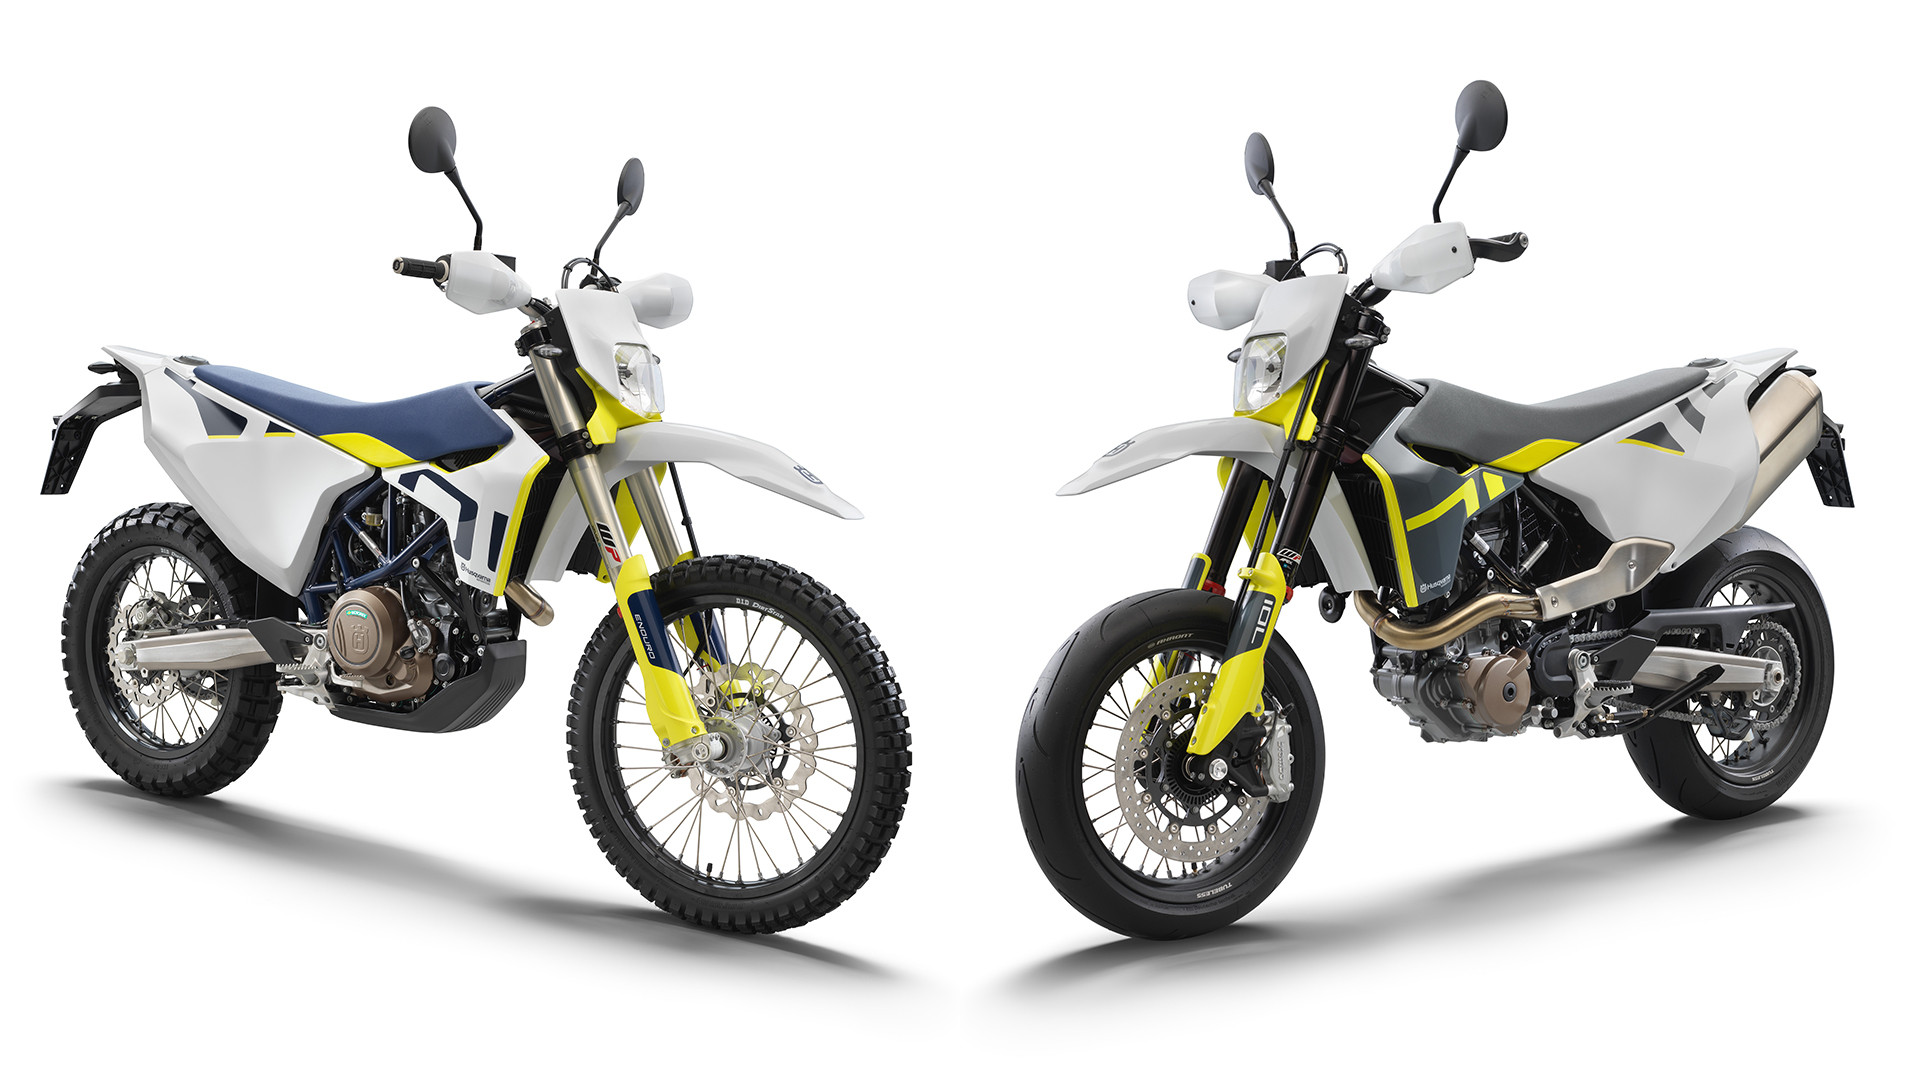 A 2021-model Husqvarna 701 Enduro (left) and a 2021-model Husqvarna 701 Supermoto (right). Photo courtesy Husqvarna.